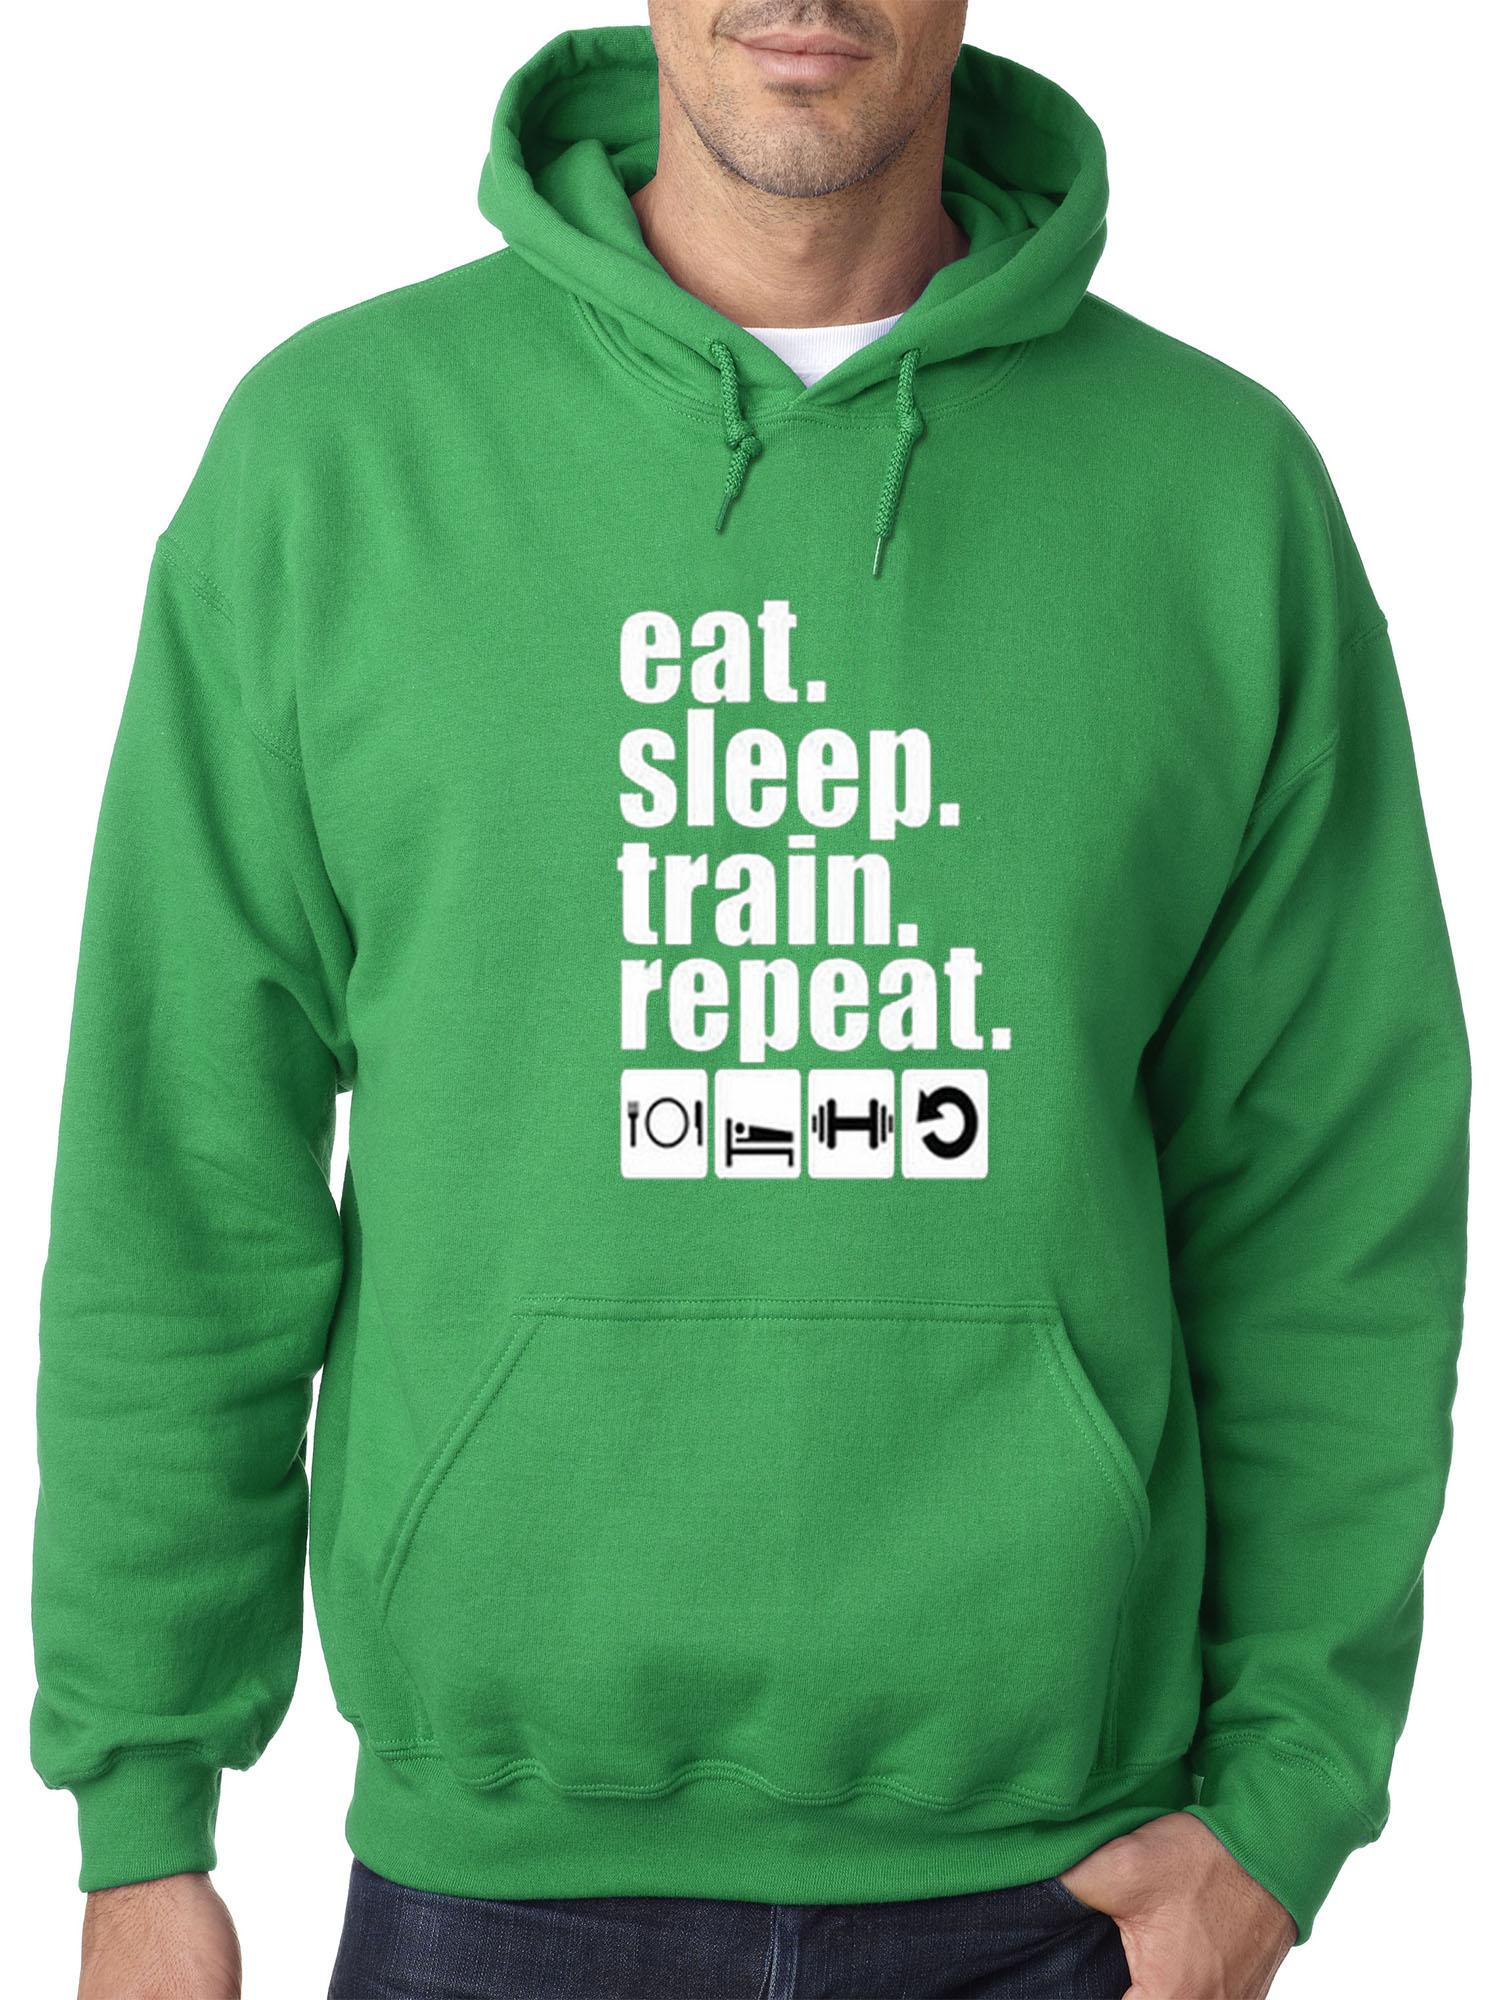 Repeat Gym Top Pullover Jumper Wellcoda Eat Sleep Train Mens Sweatshirt